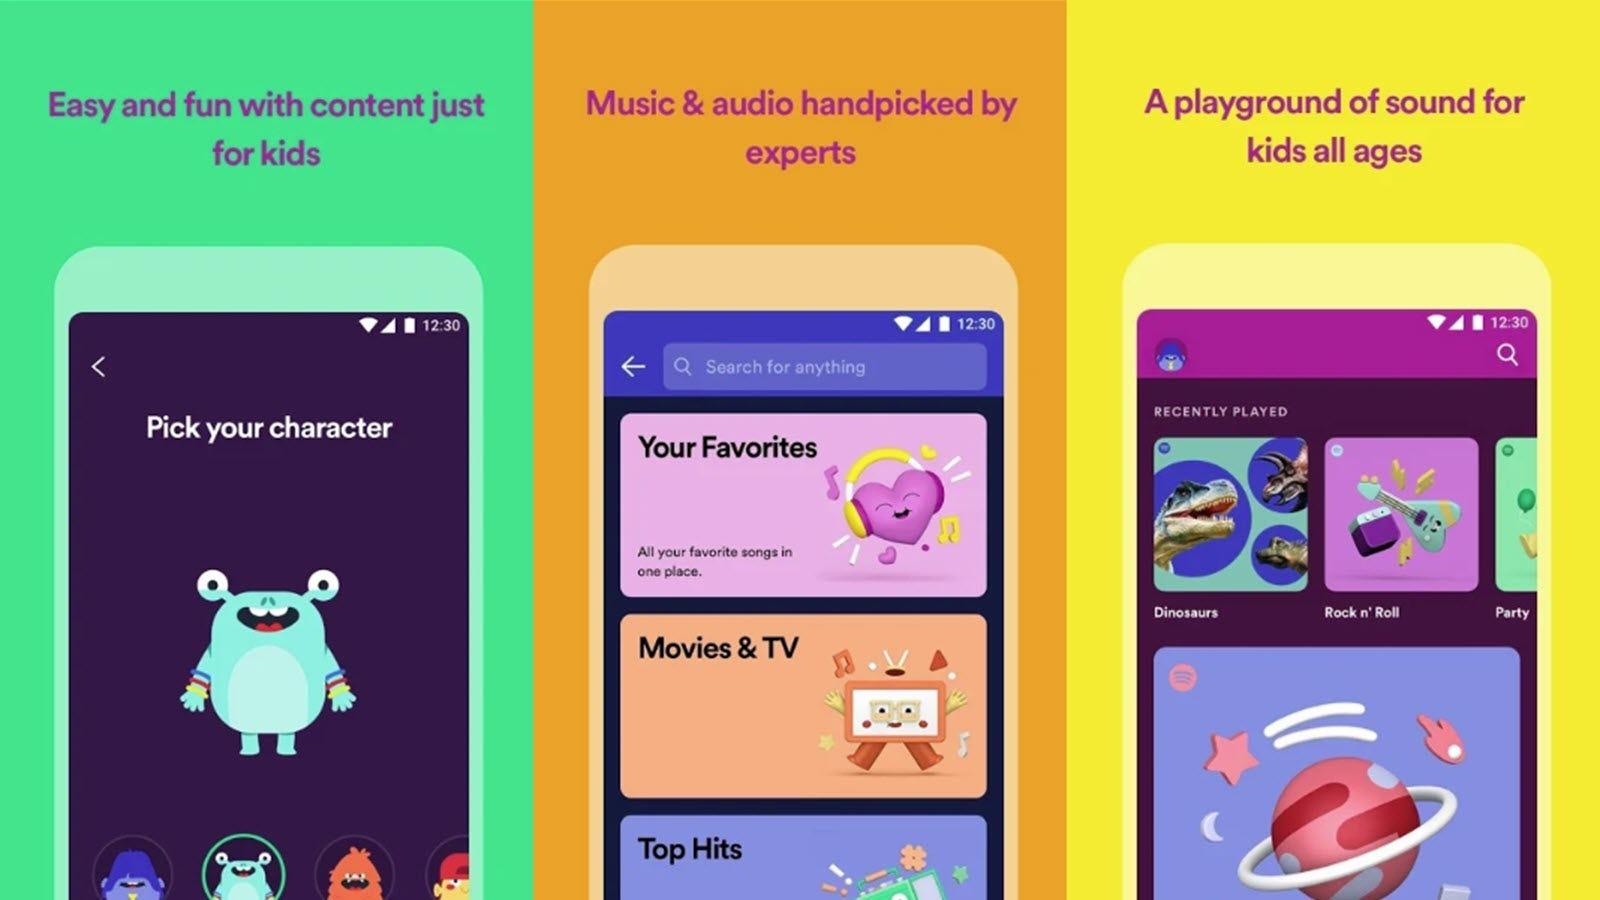 Spotify graphics showing kid-friendly avatars.